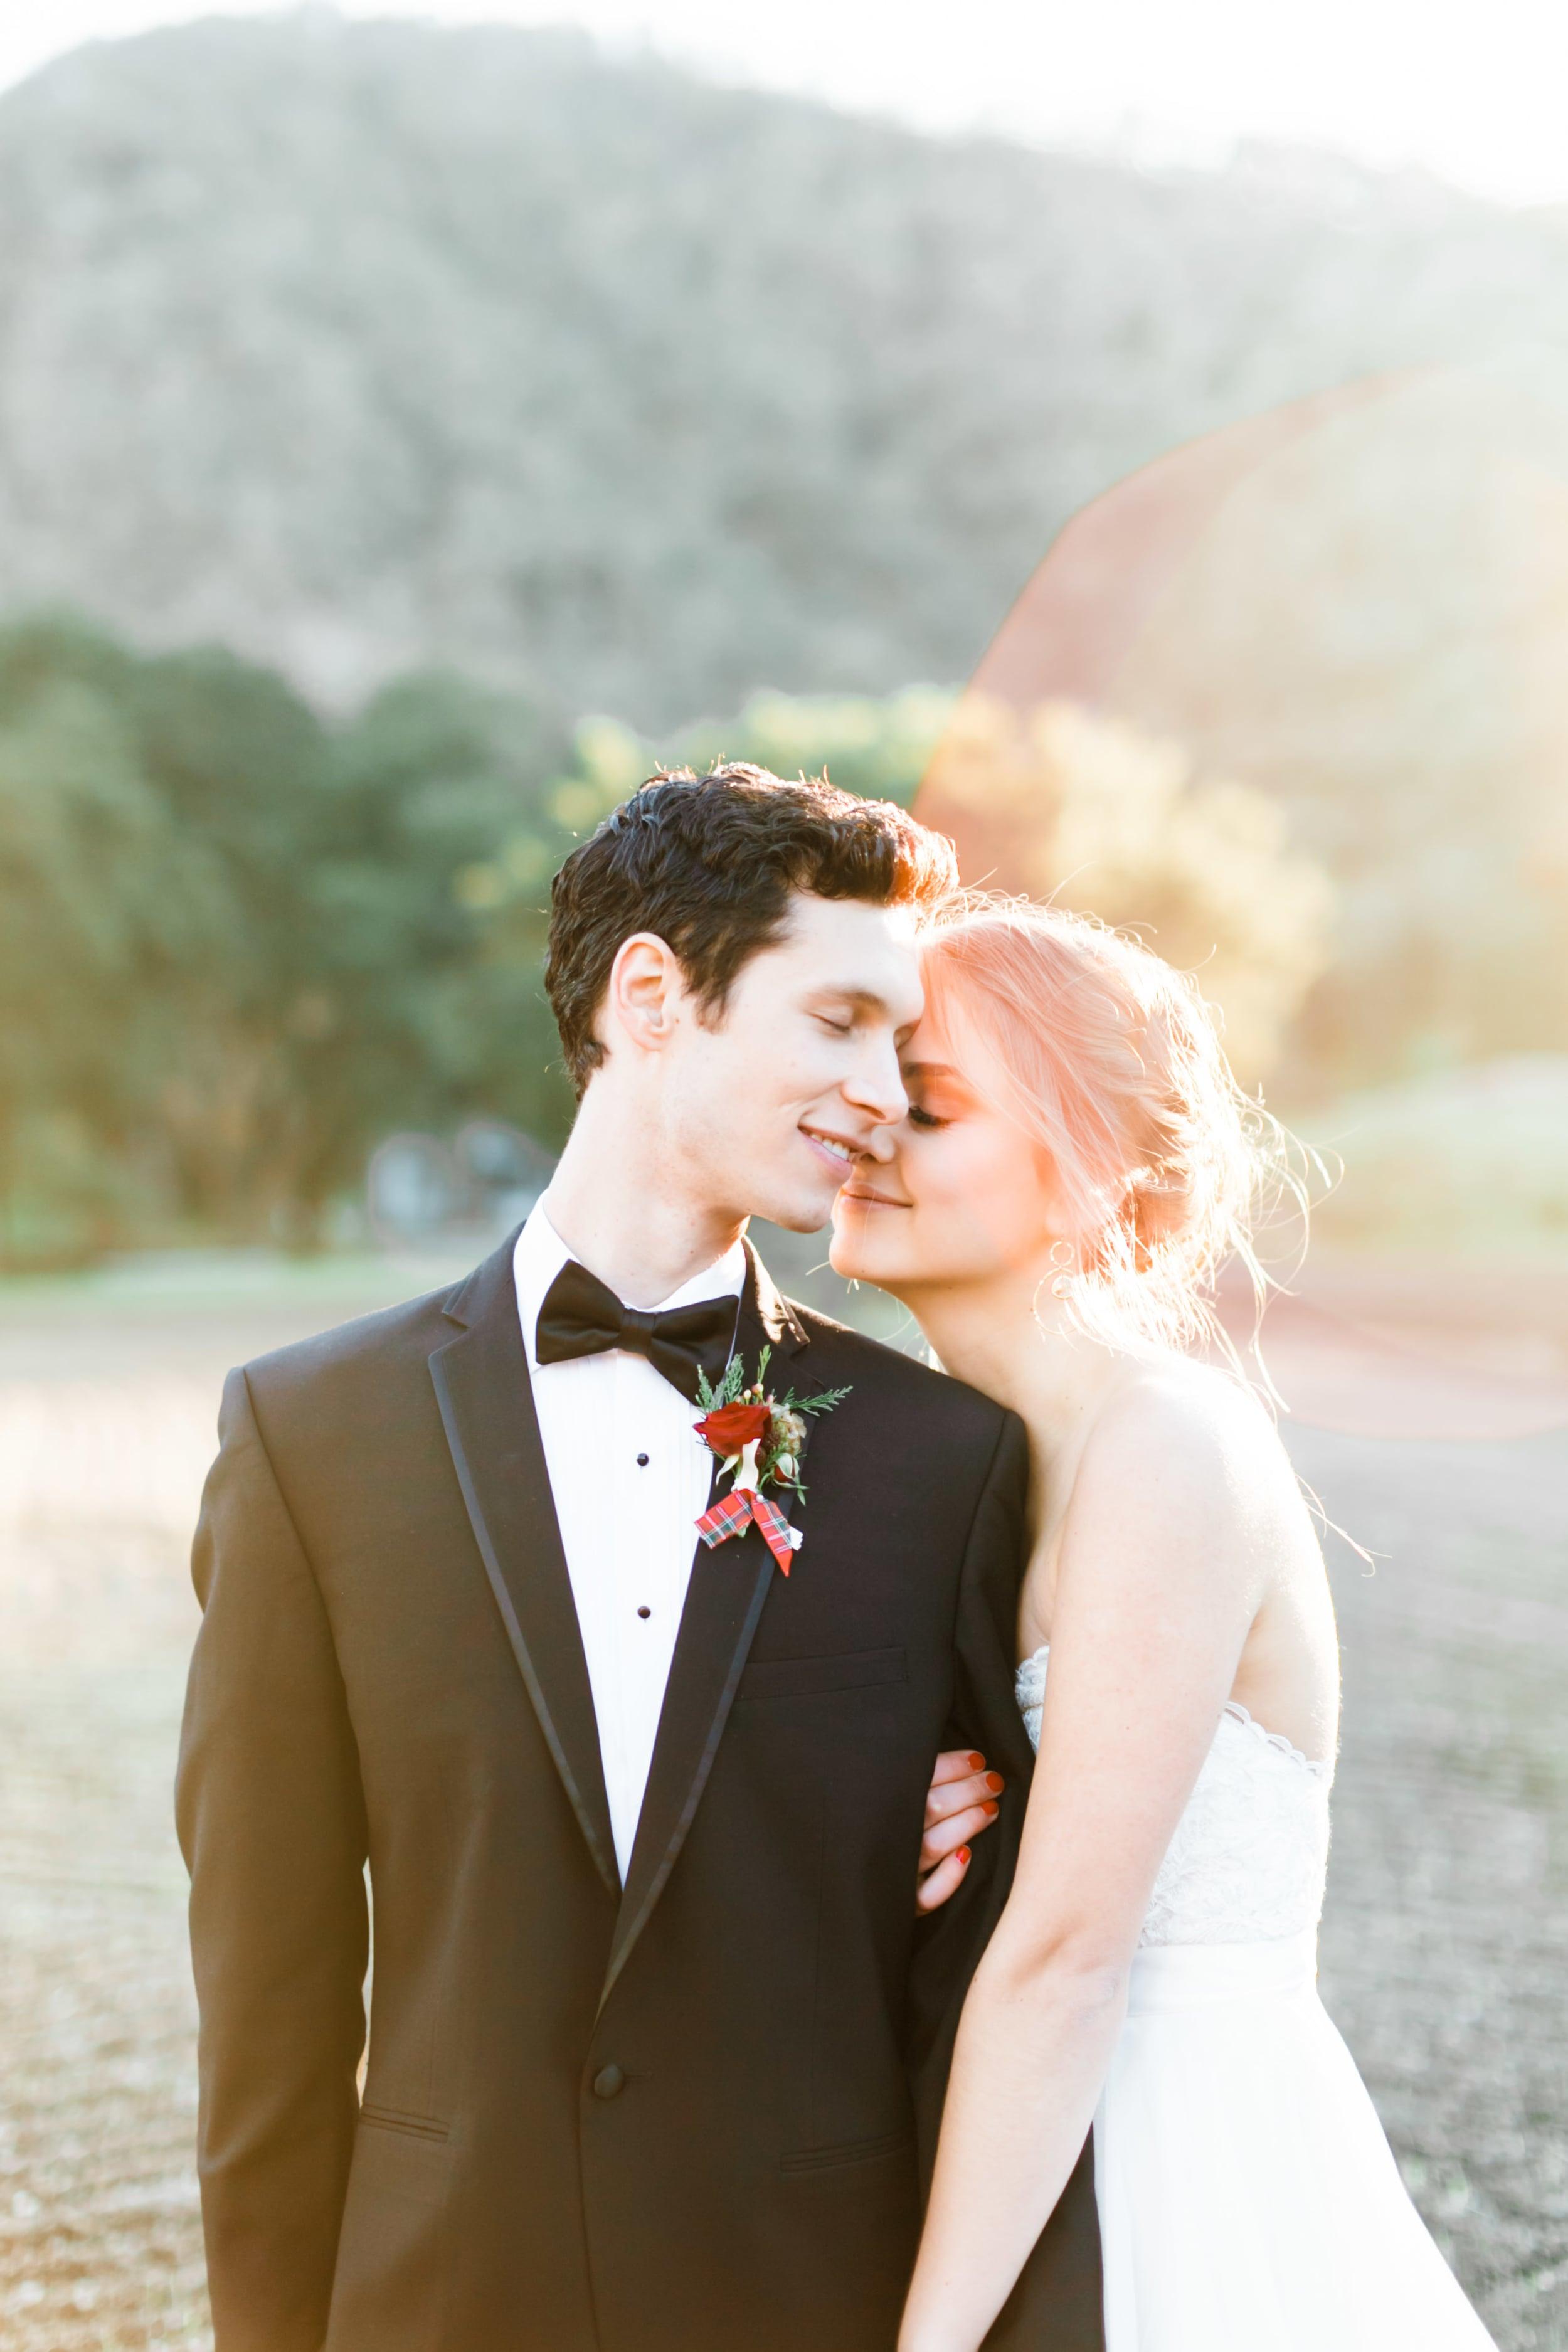 Natalie_Schutt_Photography_Winter_Wedding_San_Luis_Obispo-192.jpg